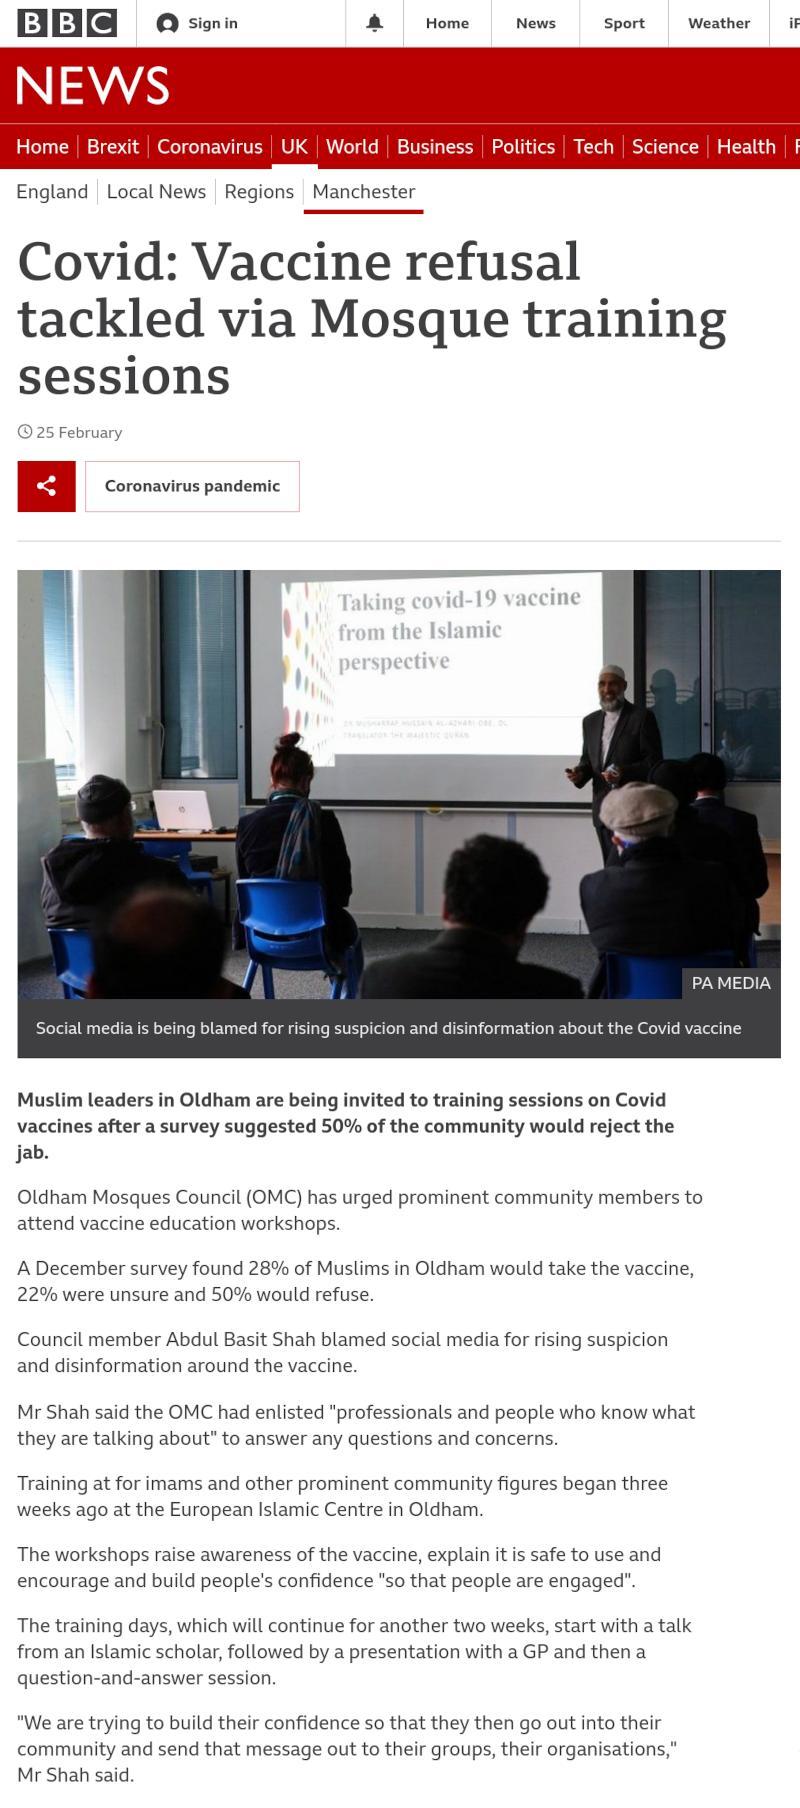 BBC News article on OMC Covid Vaccine Training